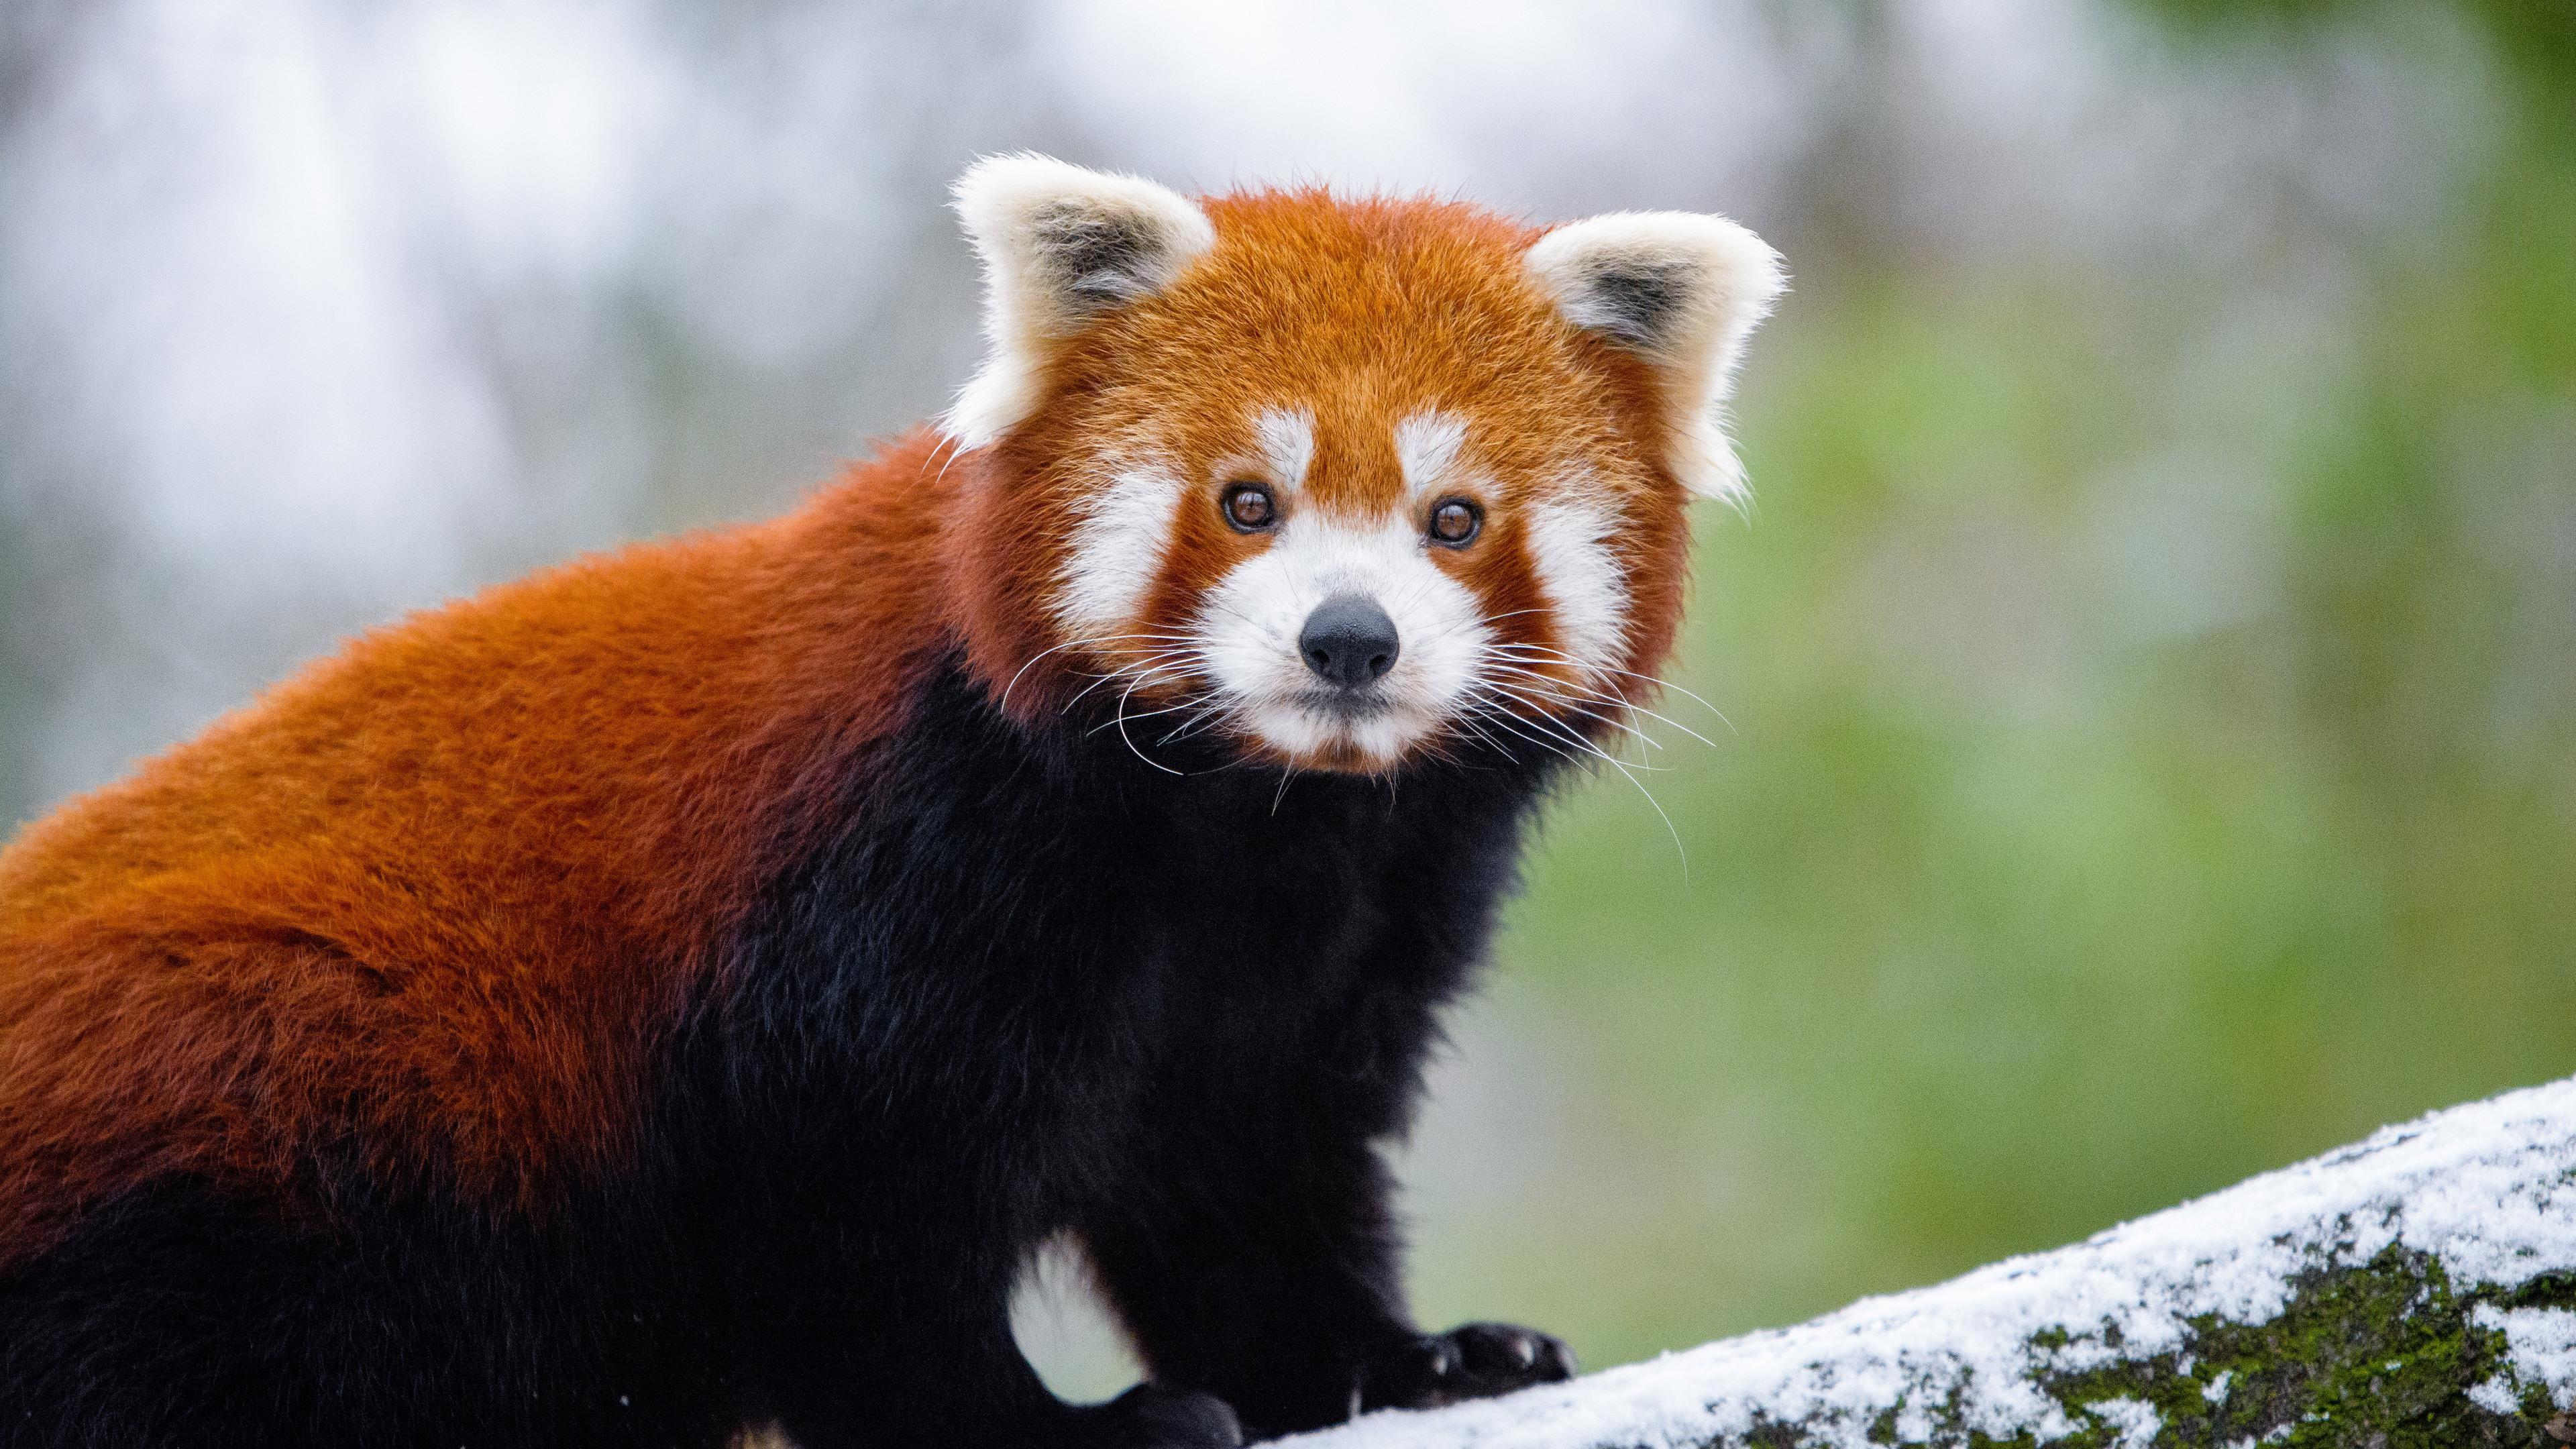 3840x2160 Red Panda 5k 4k HD 4k Wallpapers, Images ...